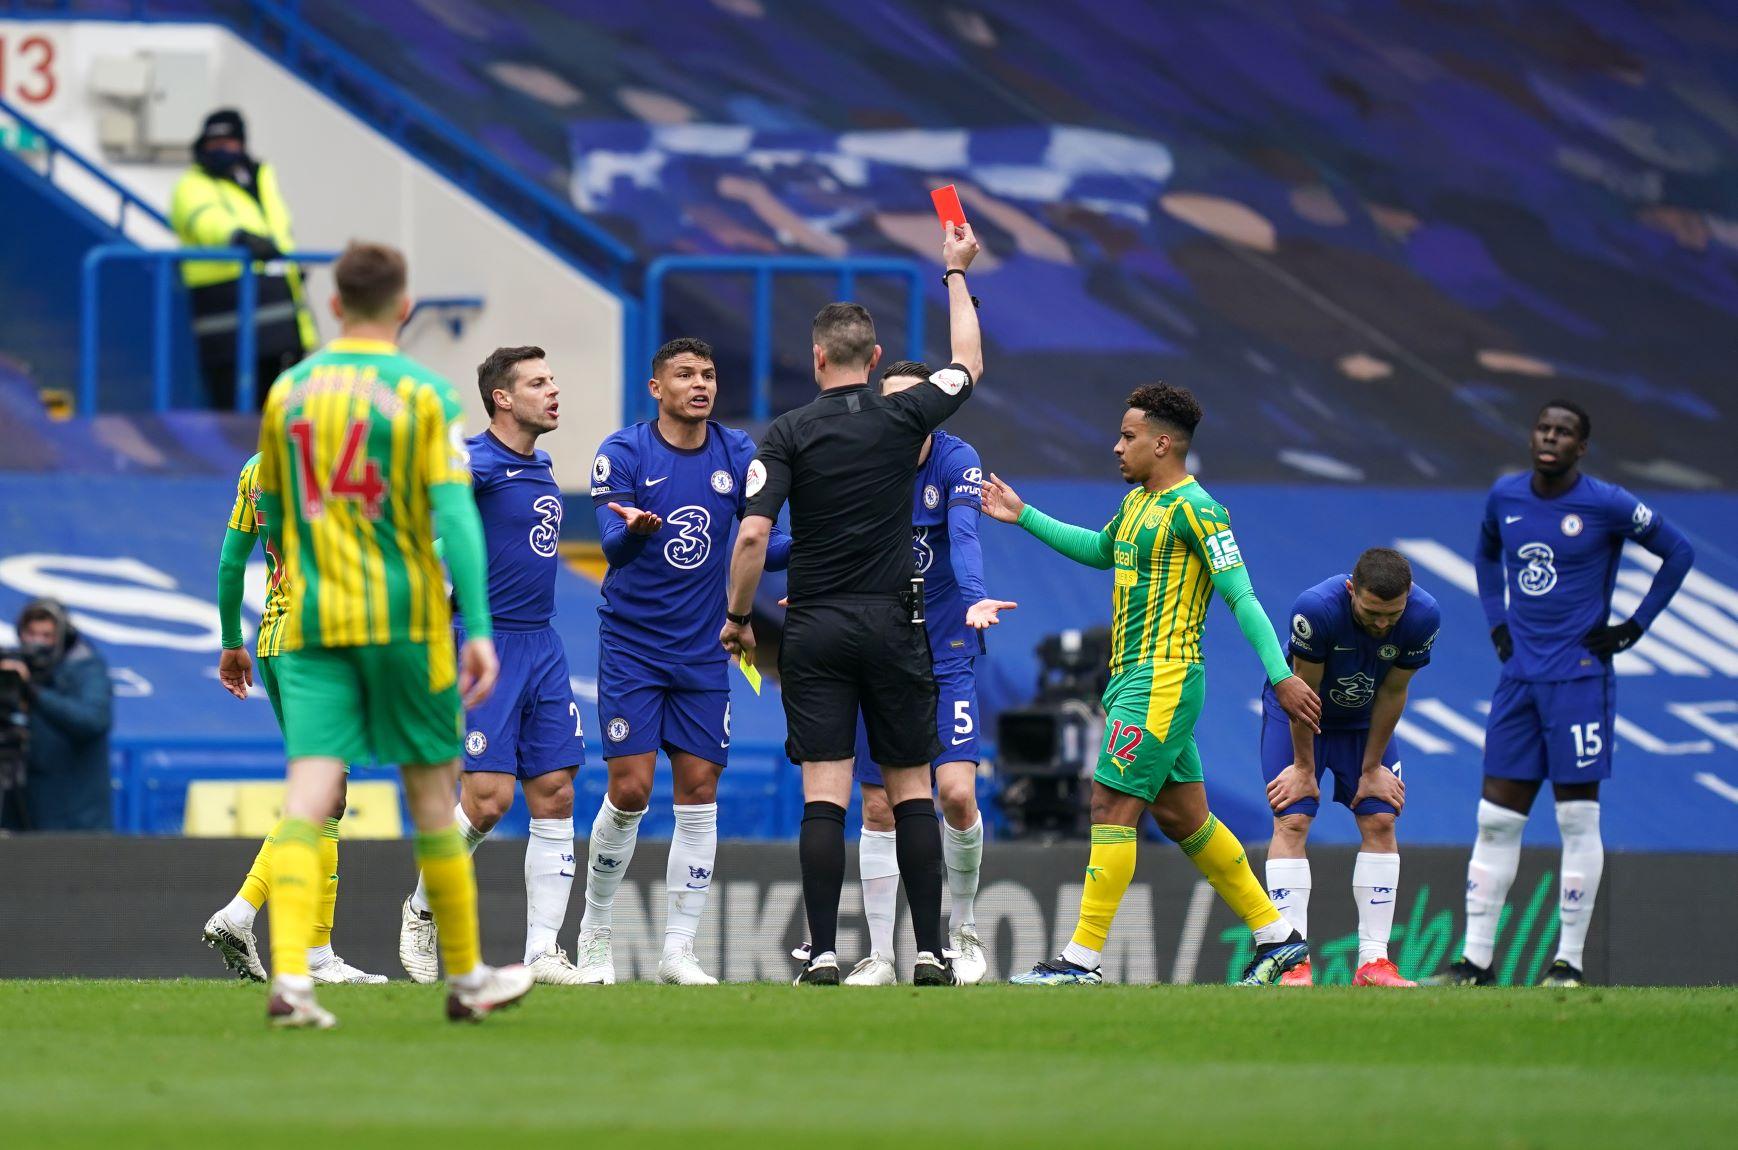 Thiago Silva recibió la tarjeta roja y dejó a Chelsea con 10 hombres